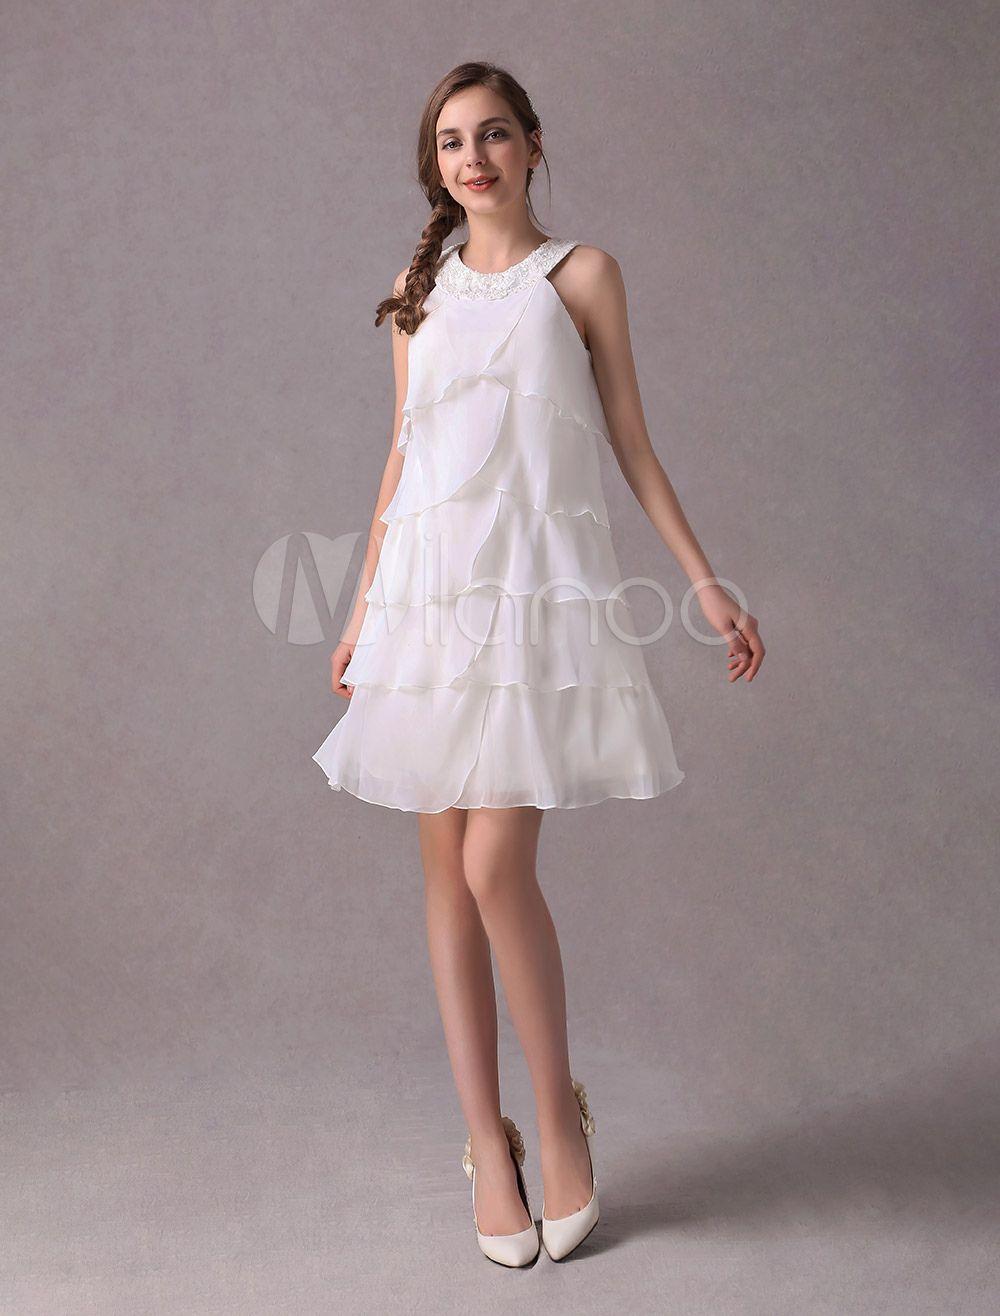 Halter style wedding dresses  Short Wedding Dresses Ivory Chiffon Cocktail Party Dress Beaded